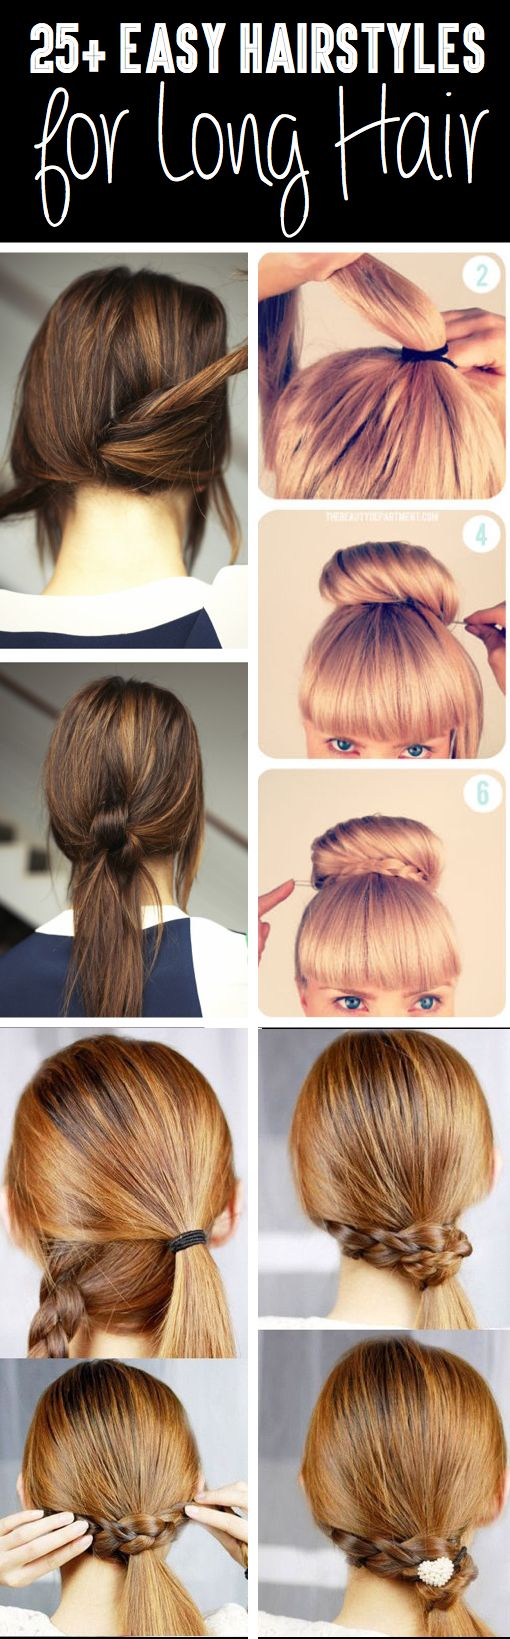 Para pelo largo hair pinterest easy hairstyles classy and easy